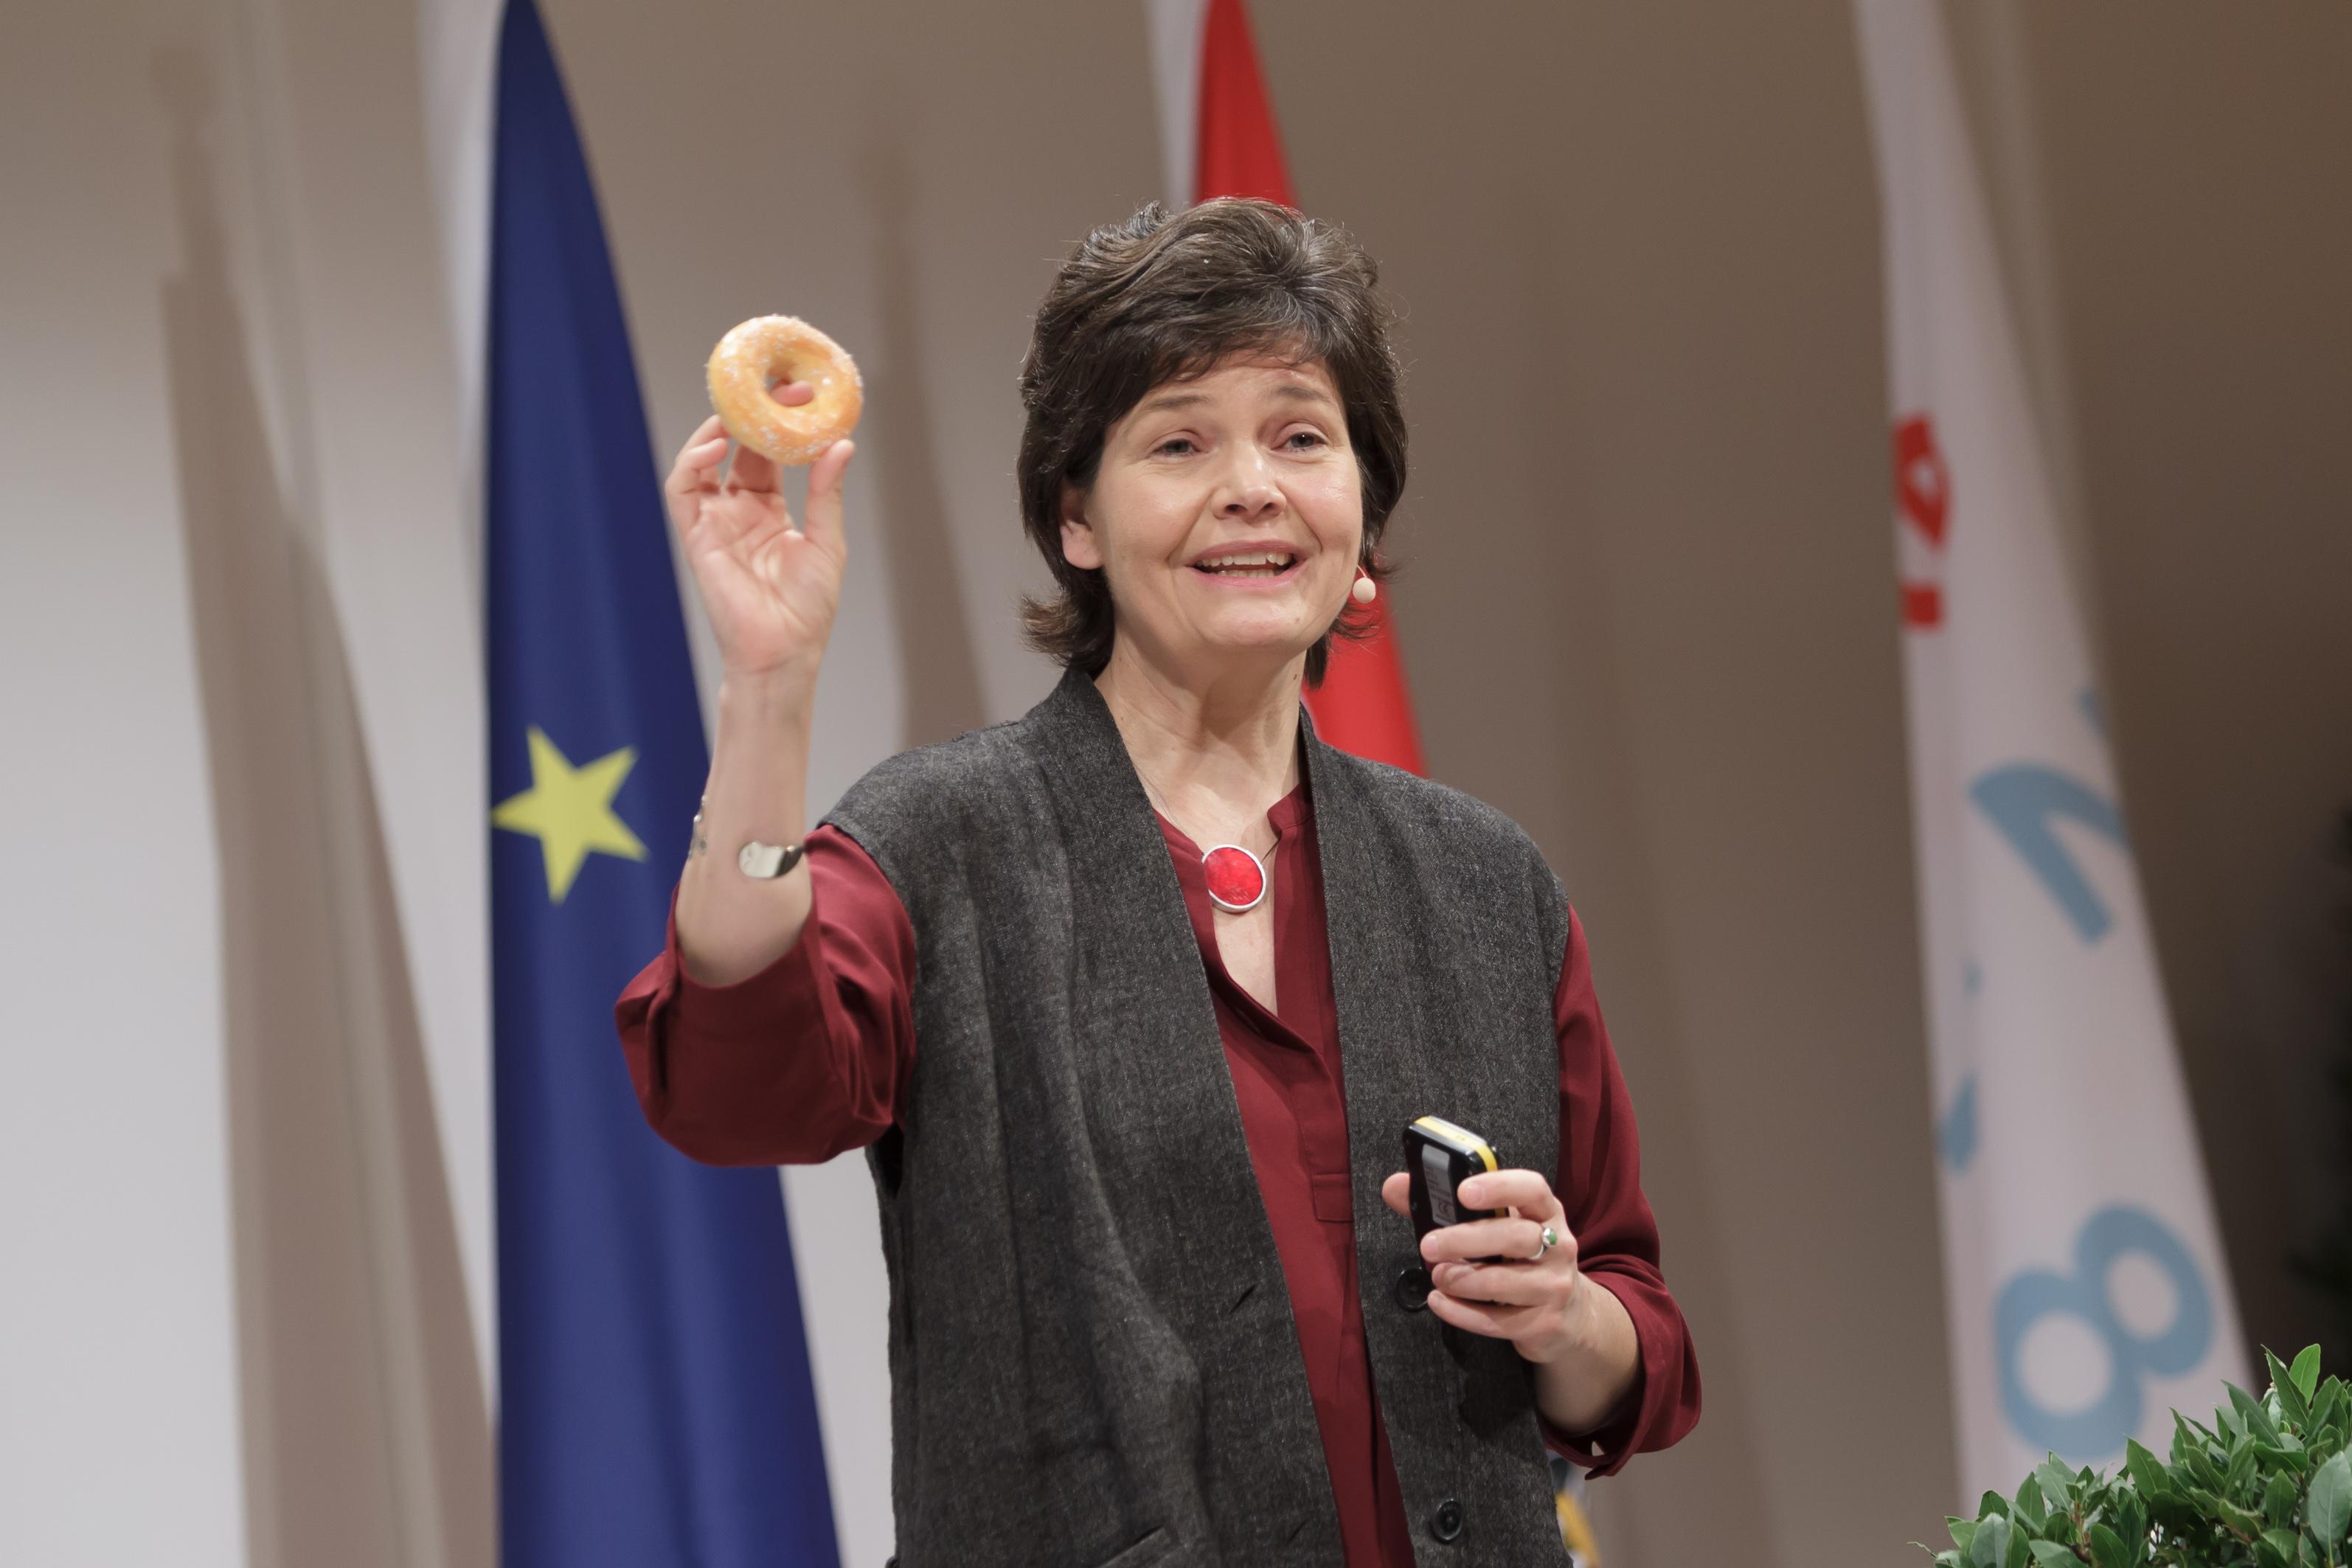 (c) Jana Madzigon